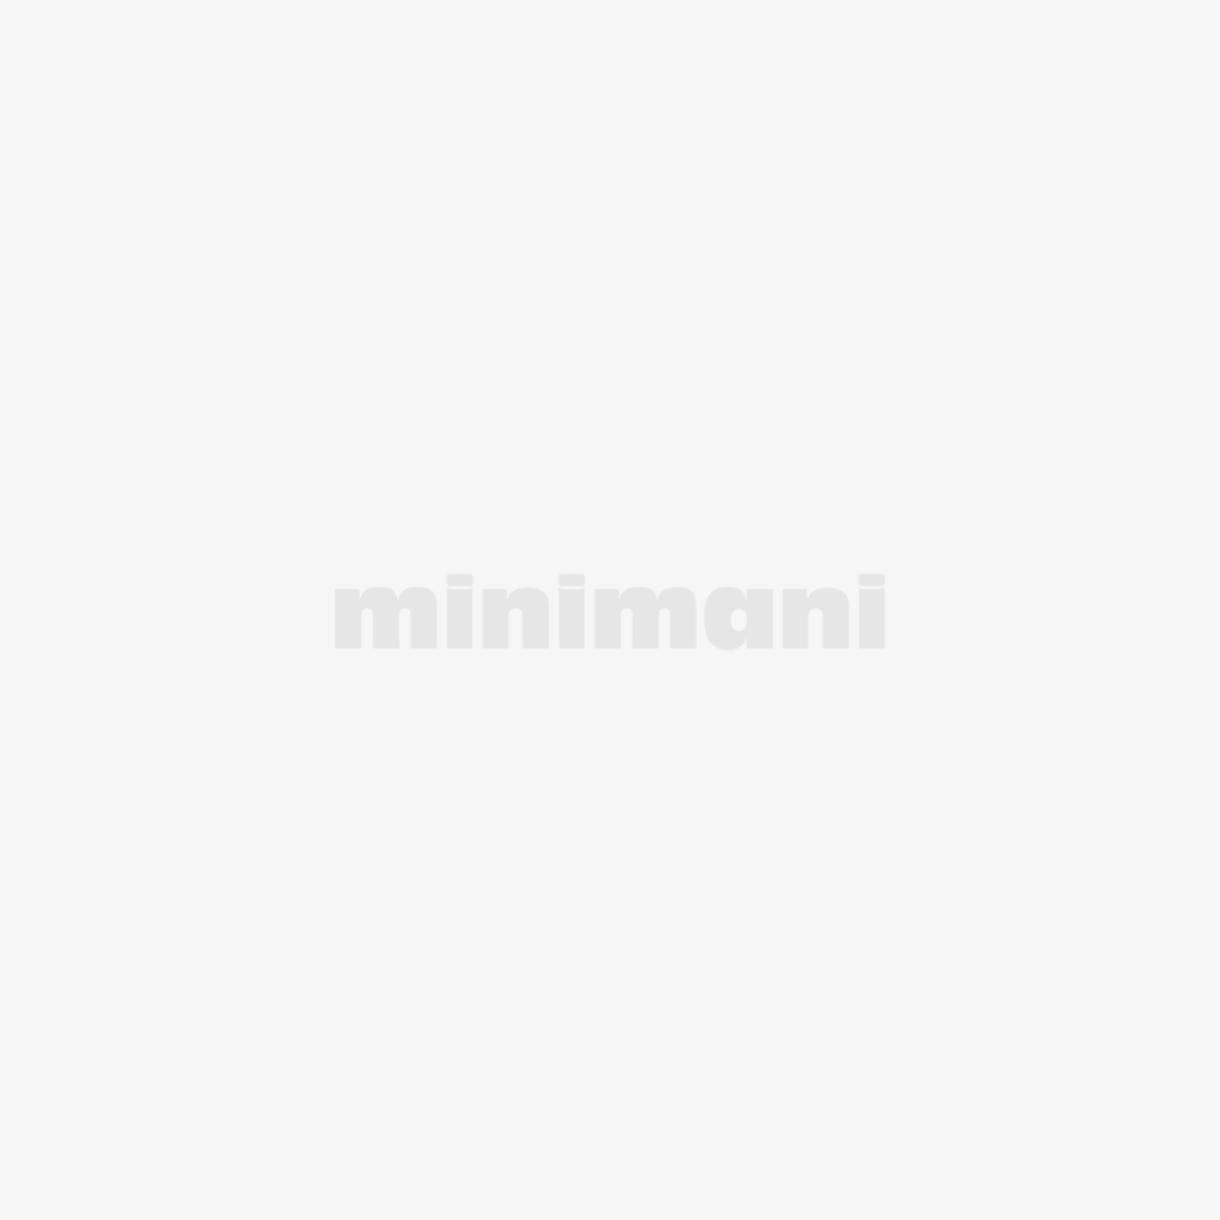 MUUMI JUOMAPULLO PIKKU MYY PINKKI 0,65L